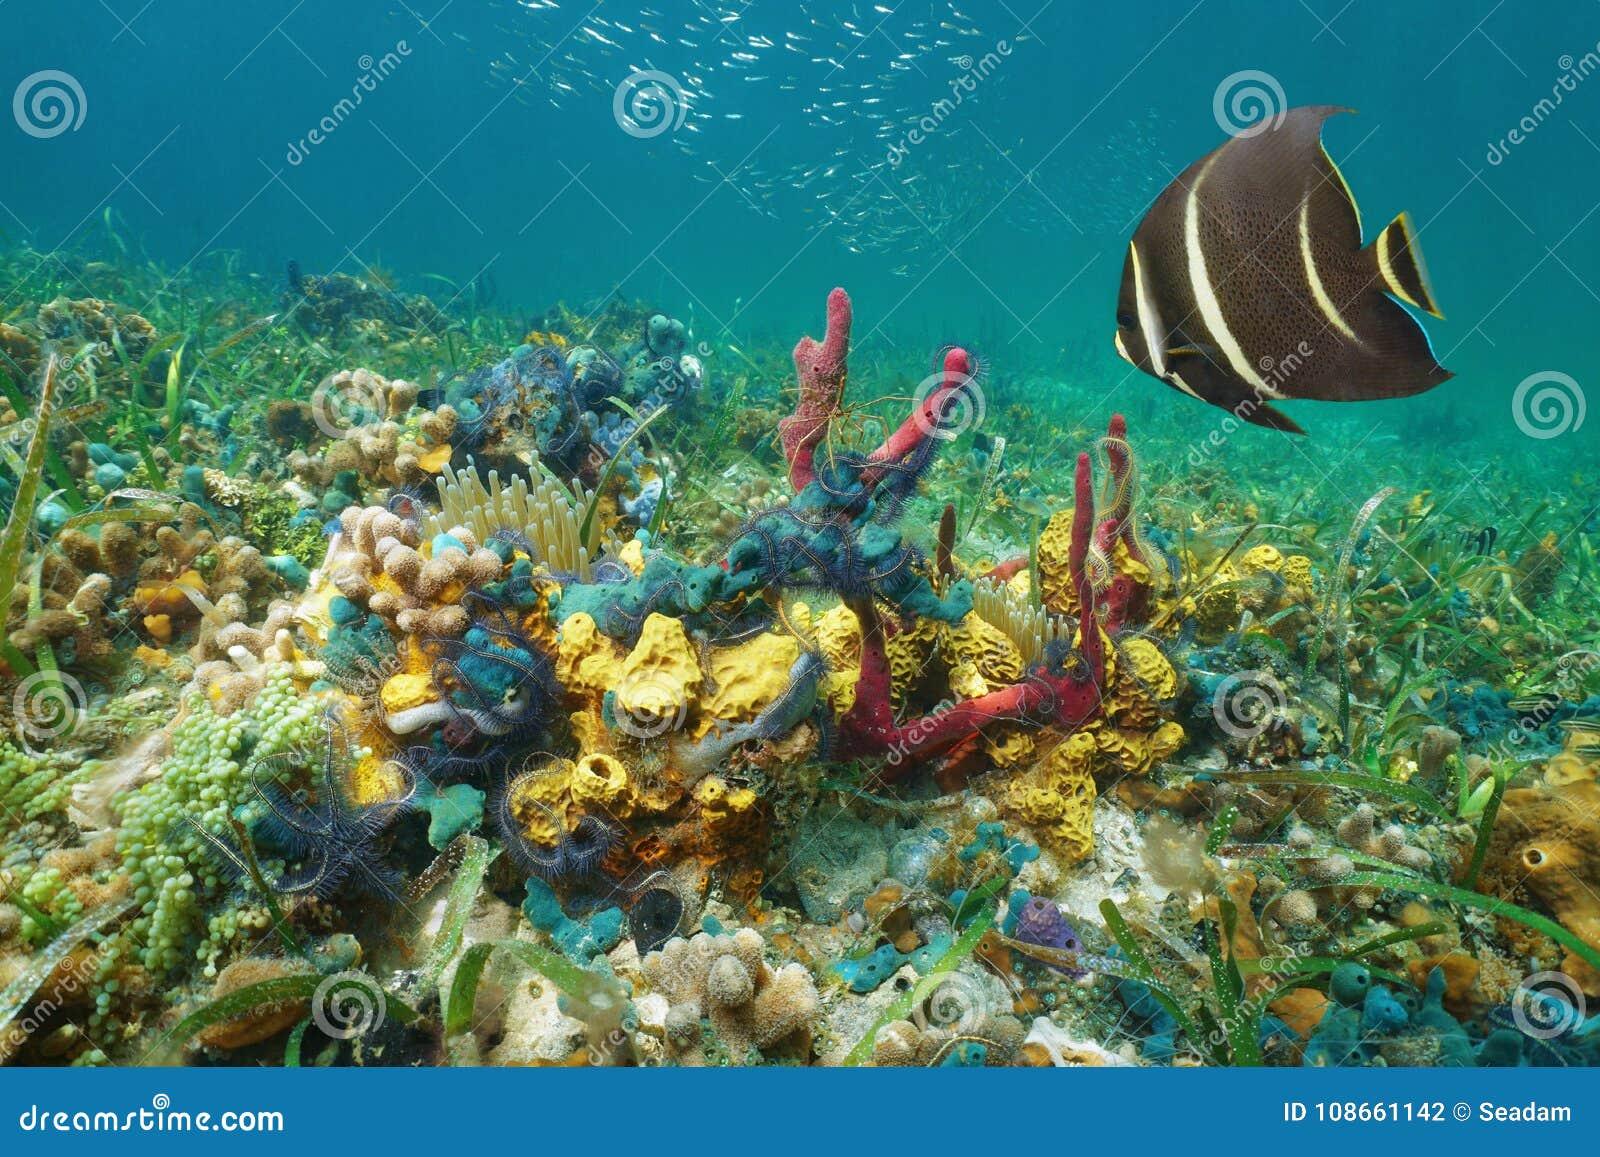 Caribbean Sea Animal Life: Colorful Underwater Marine Life Caribbean Sea Stock Photo